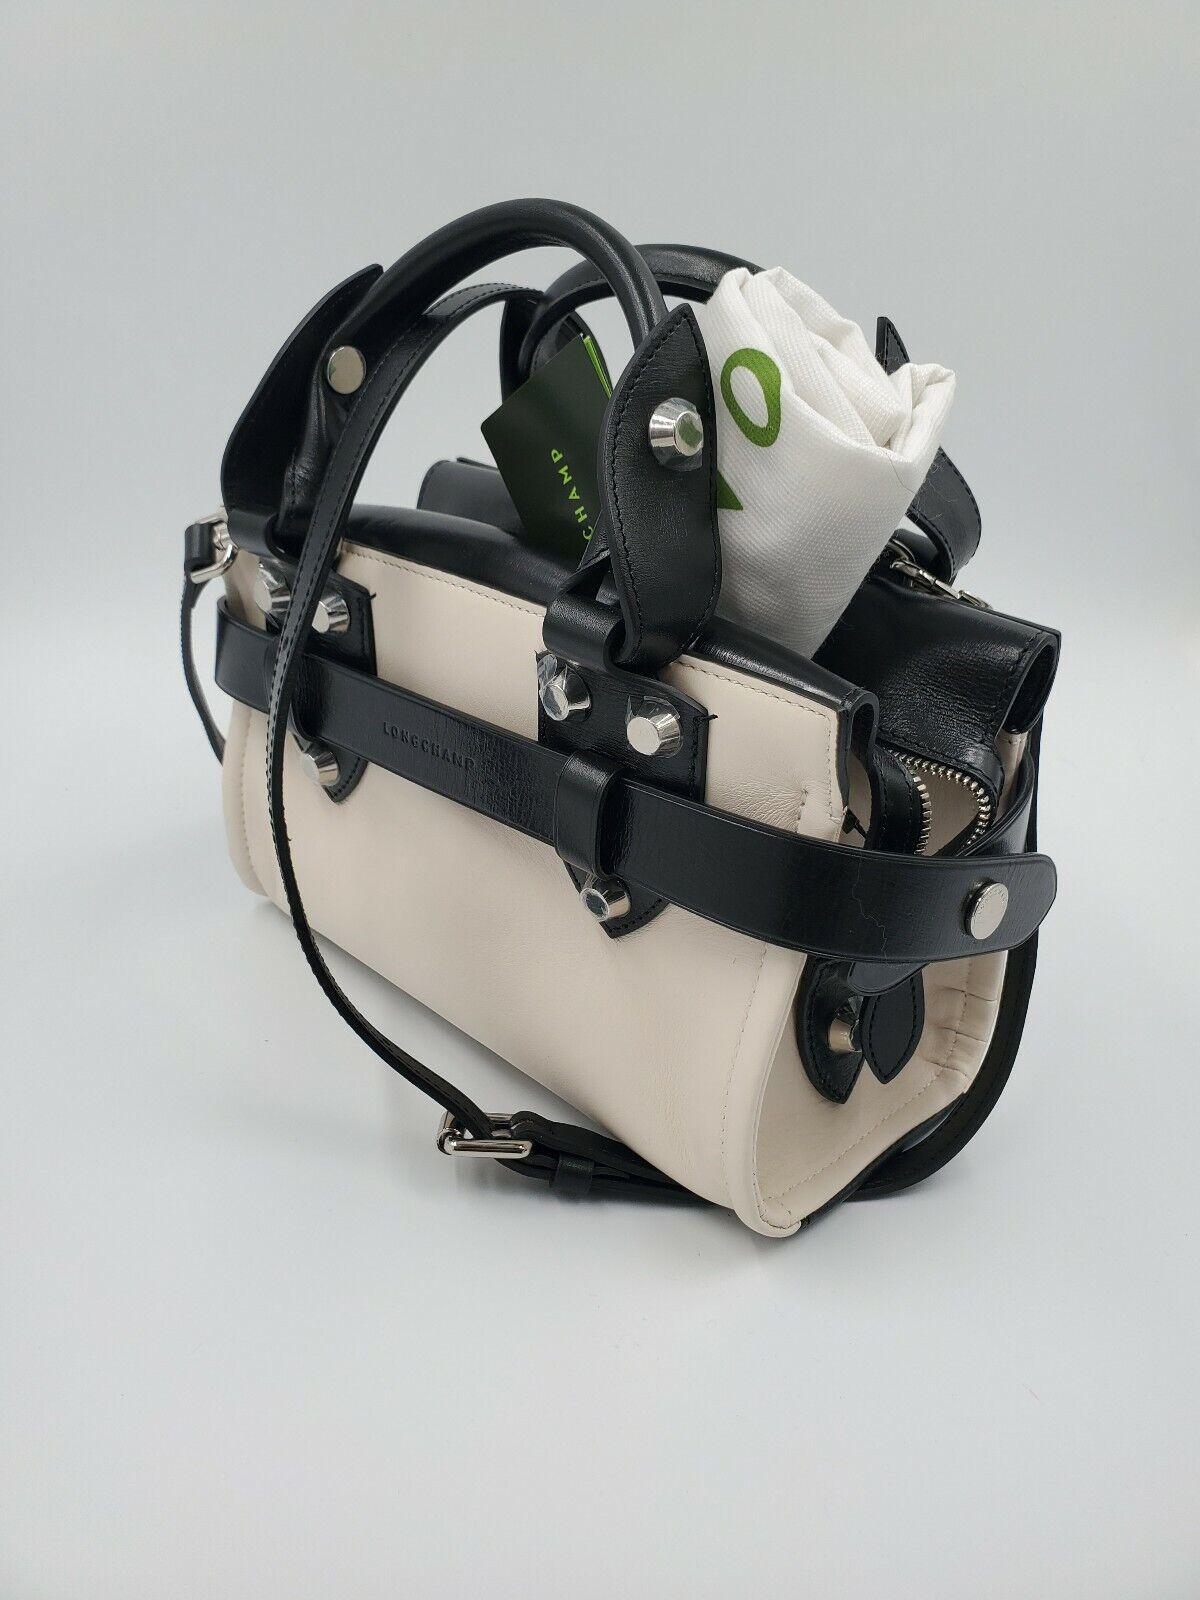 Longchamp La Voyageuse Top Handle Bag S Satchel Crossbody Ecru Black Leather